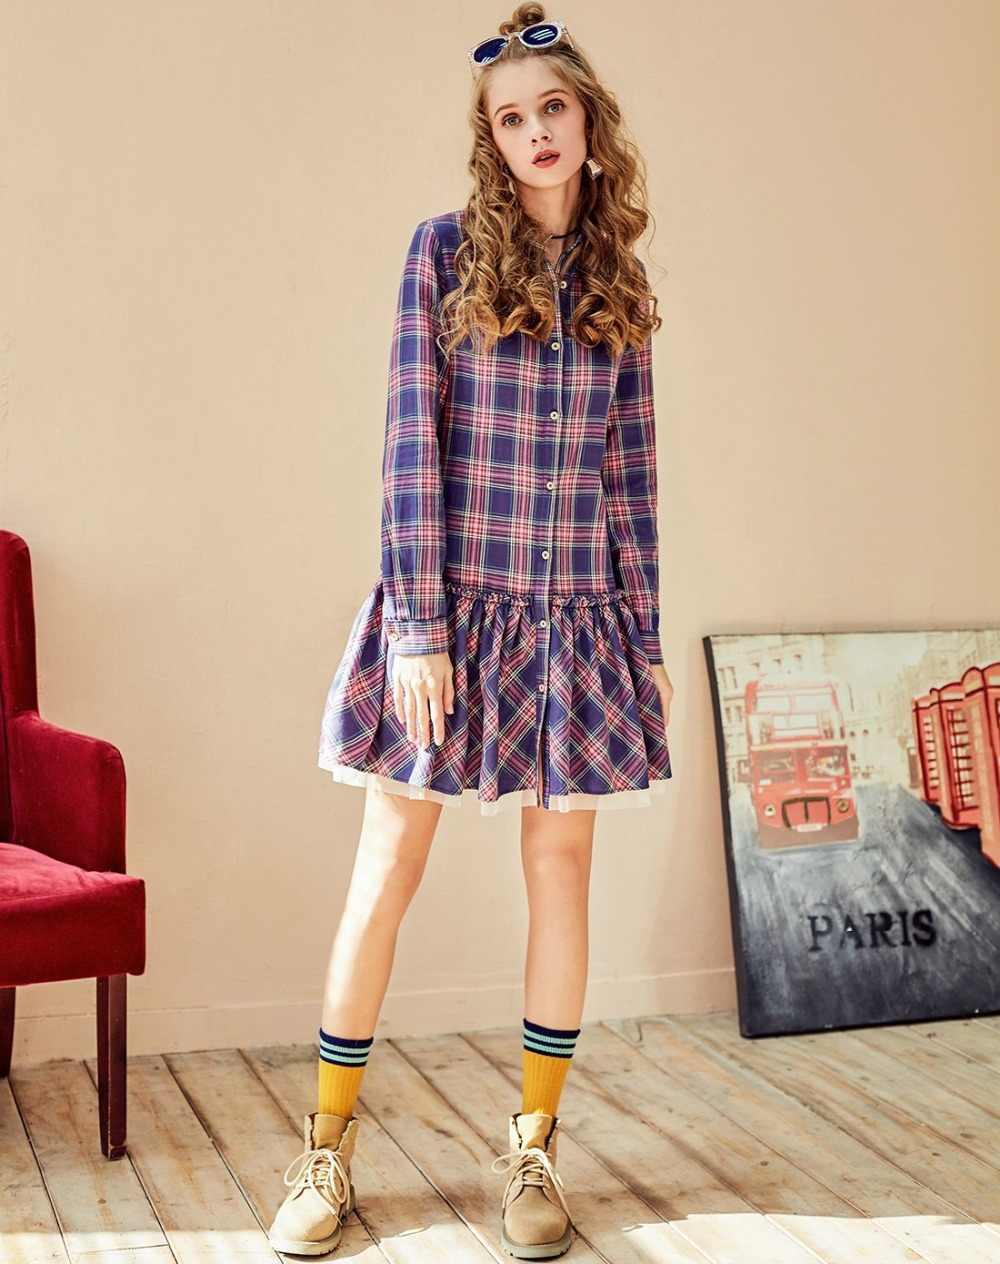 ARTKA 2018 סתיו חדש נשים מקרית כותנה הסטודנטיאלי סגנון אונליין פרע פנס שרוול משובץ שמלת LA10883C